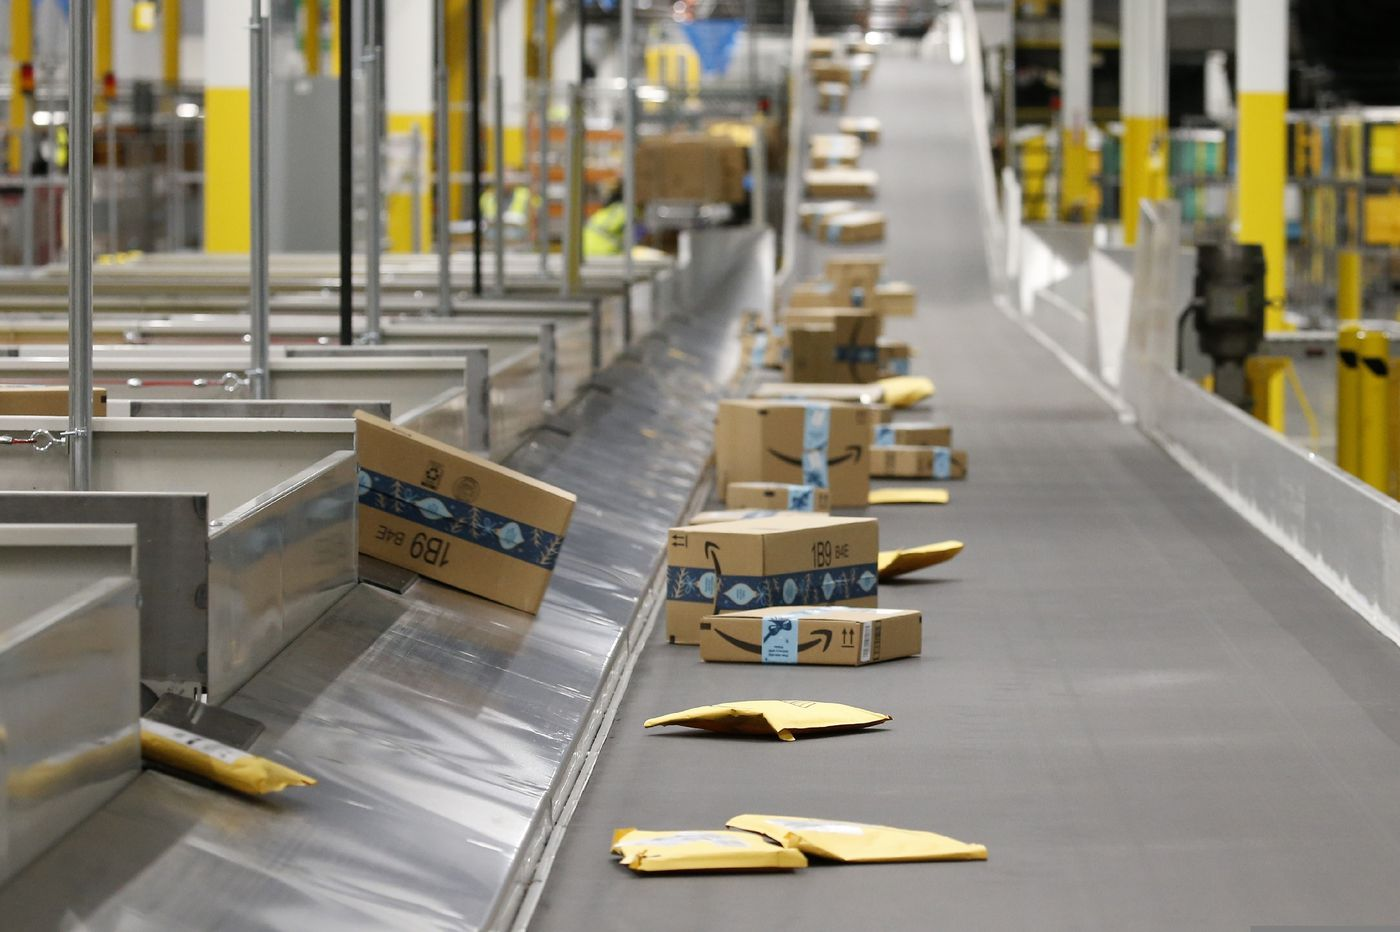 https://anysizedealsweek.com/wp-content/uploads/2020/03/Amazon-warehouse.jpg